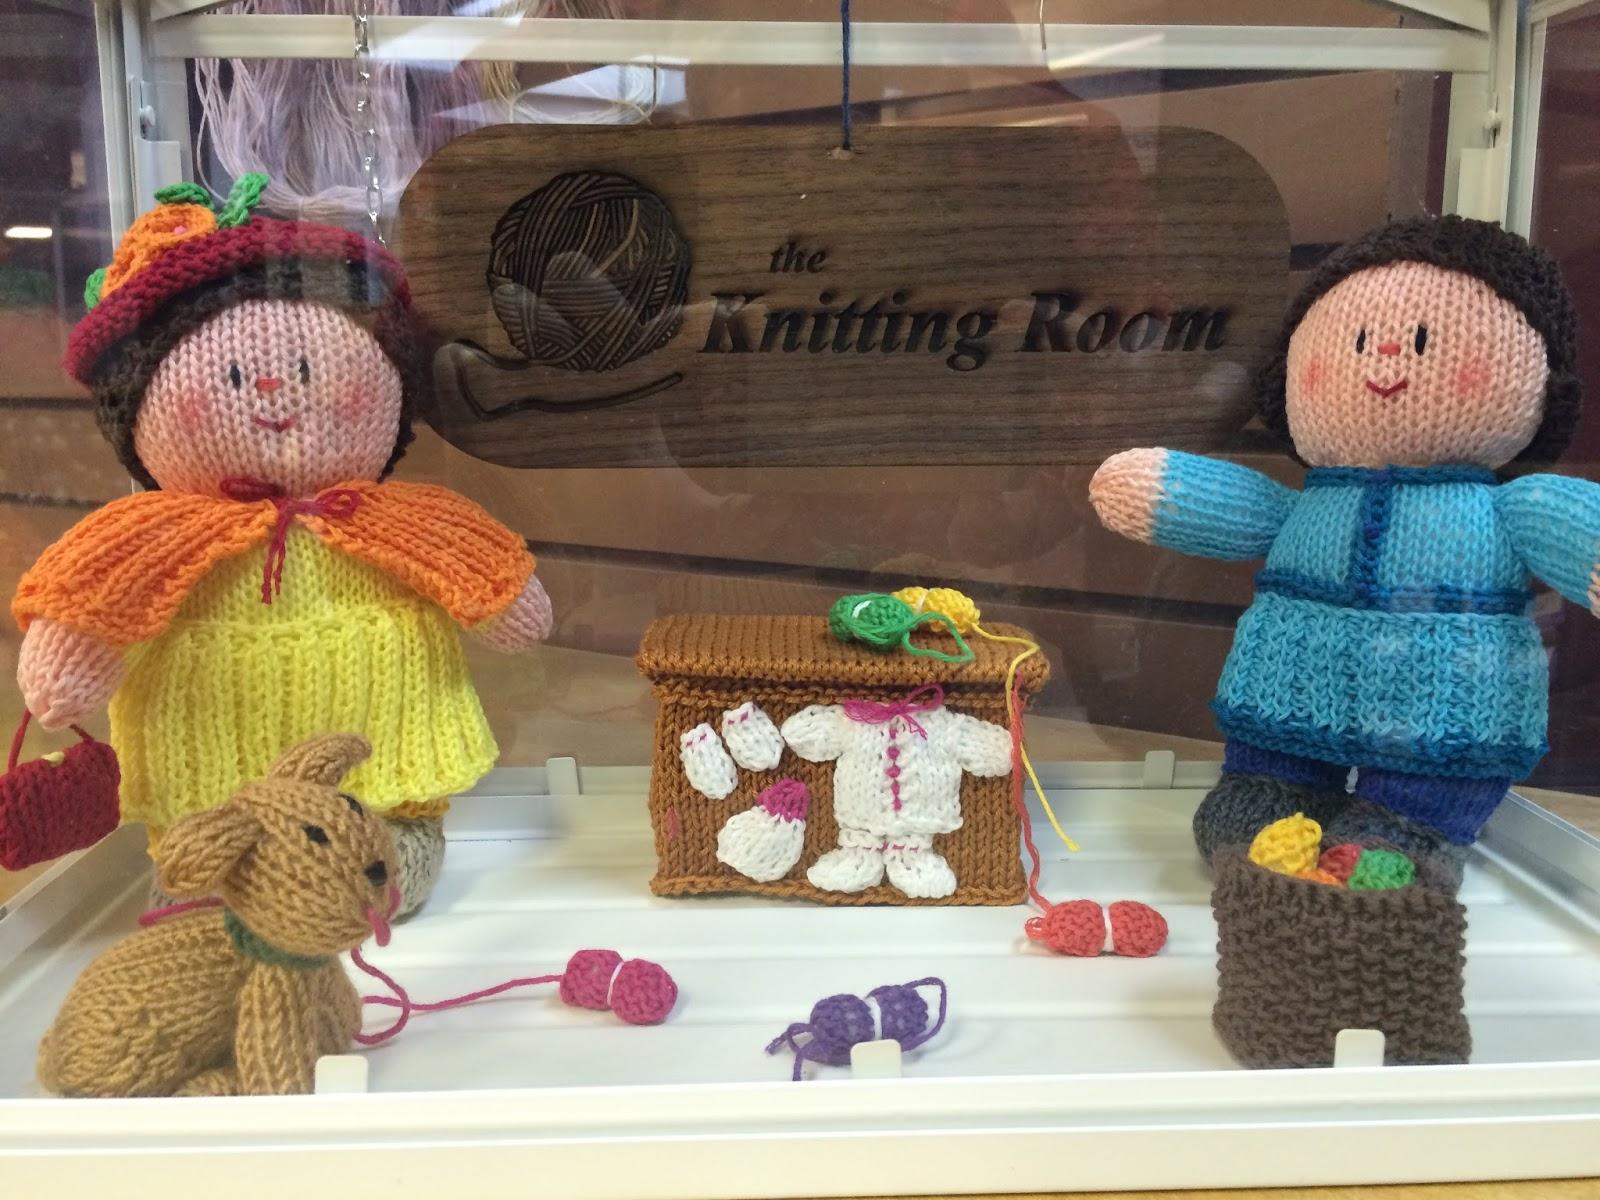 Knitting Roomfi : The knitting room